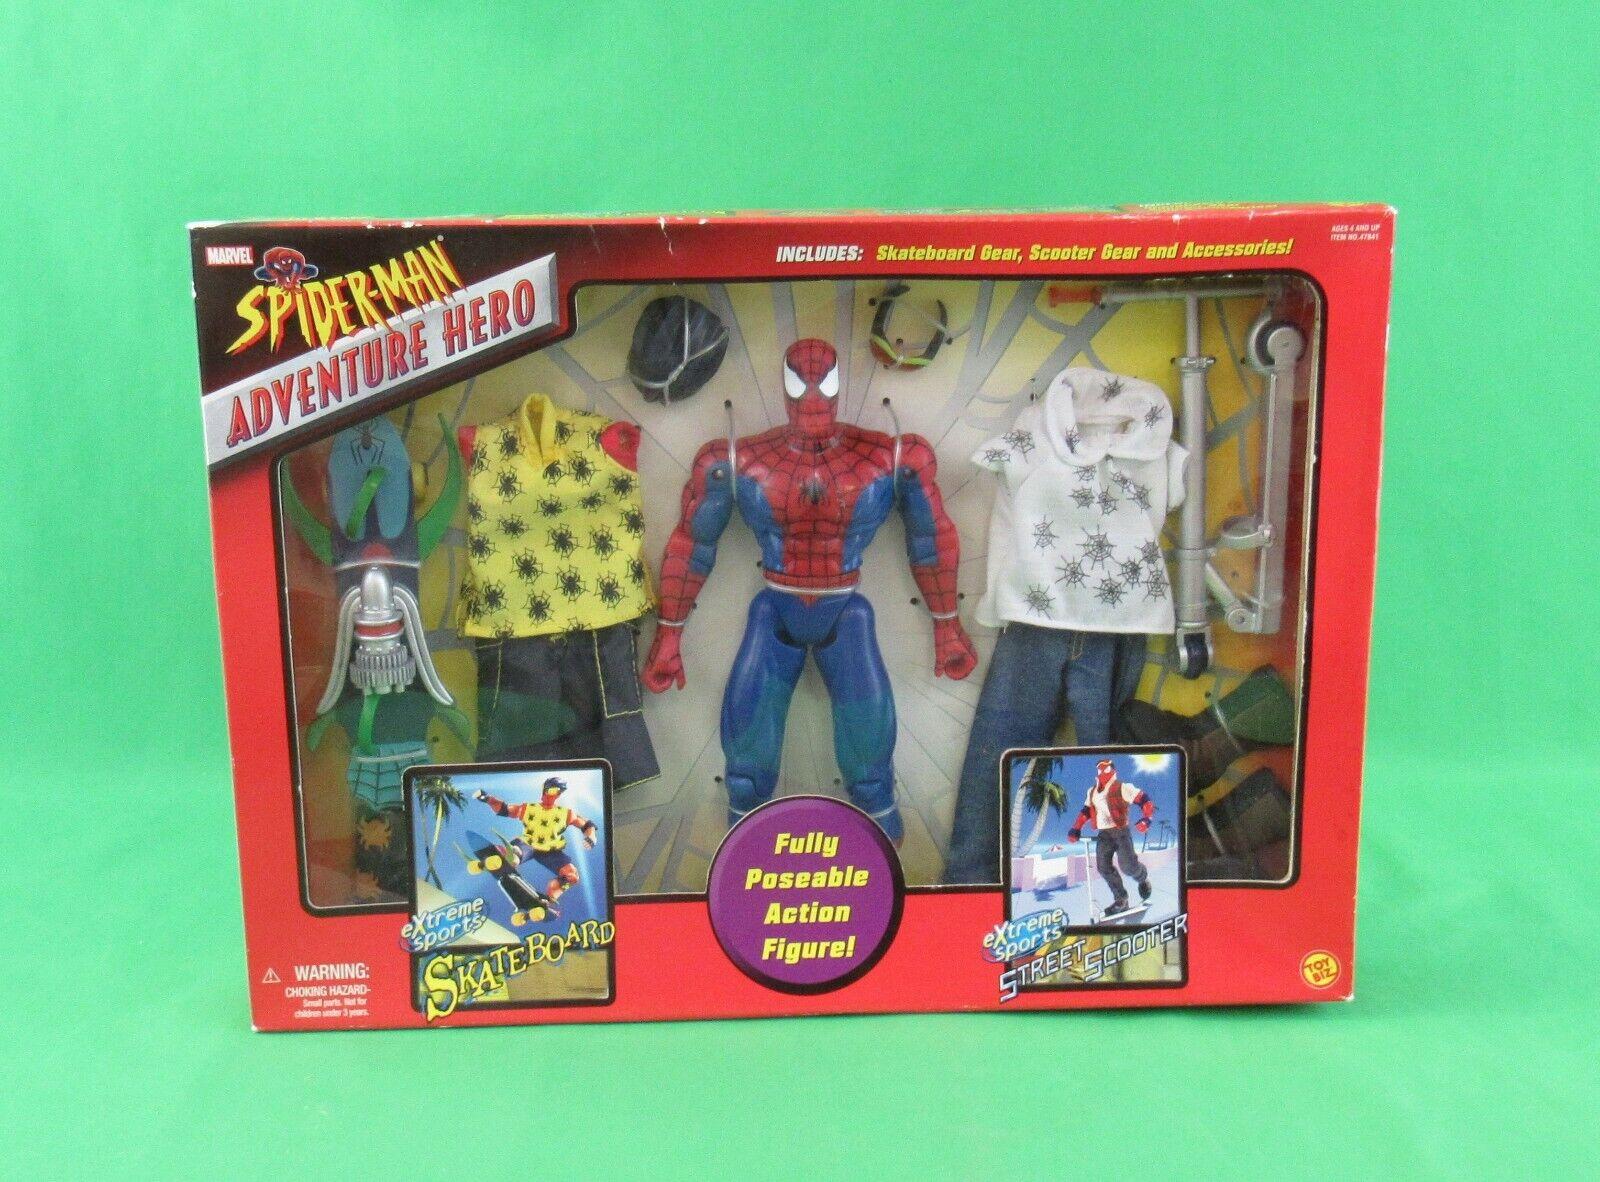 giocattoloBiz Marvel Spider-uomo Adventure Hero cifra with Gear & Accessories Sealed